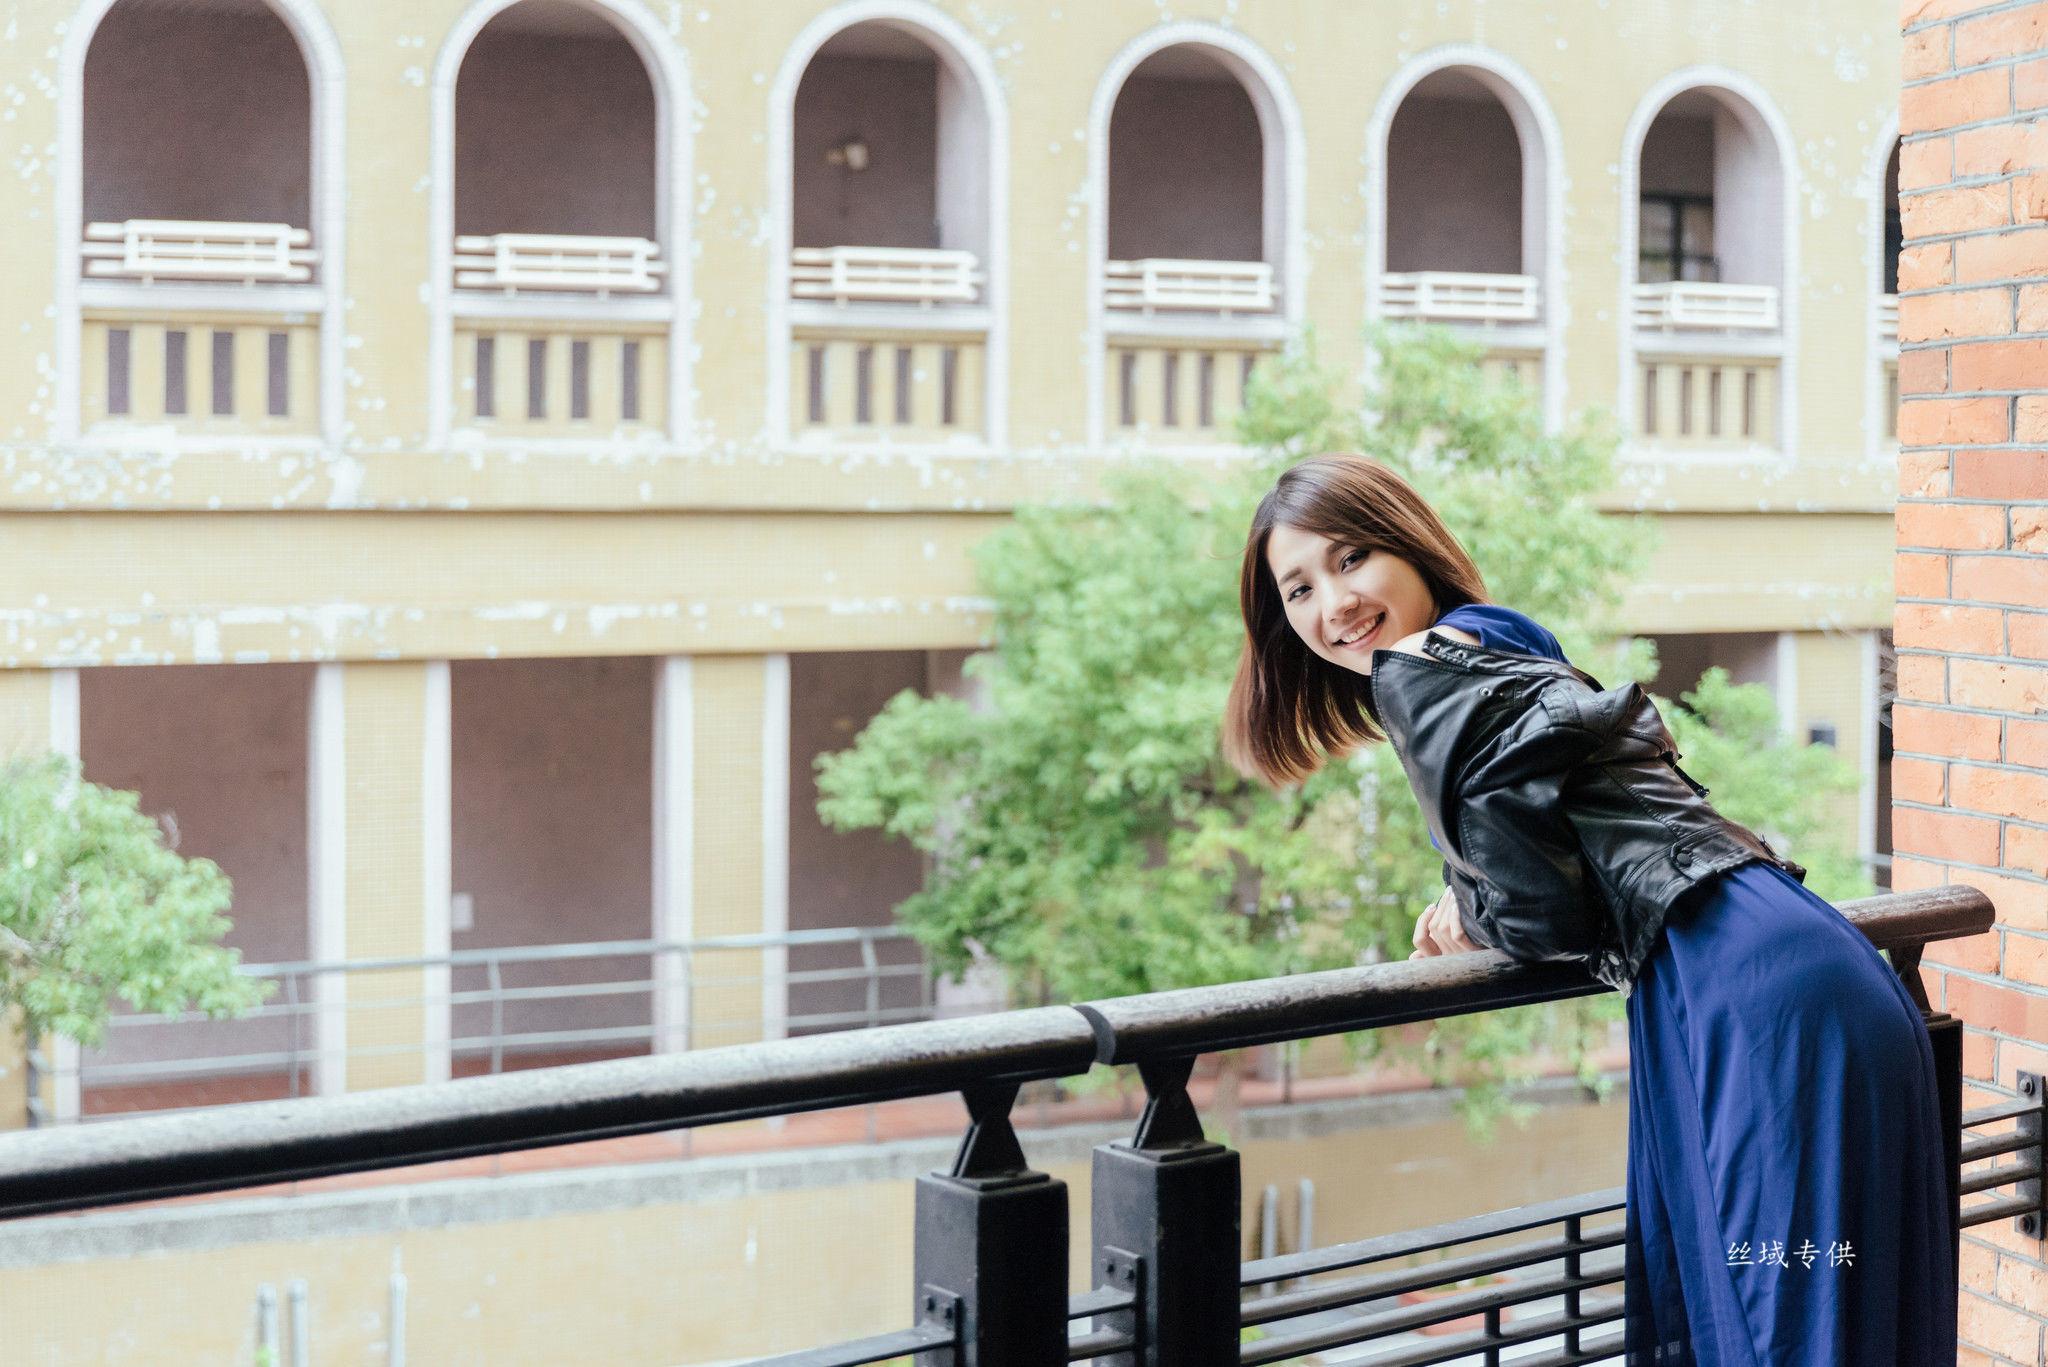 VOL.960 [台湾正妹]街拍街拍美臀:黄竹萱(Sabrina宣萱儿)超高清个人性感漂亮大图(17P)